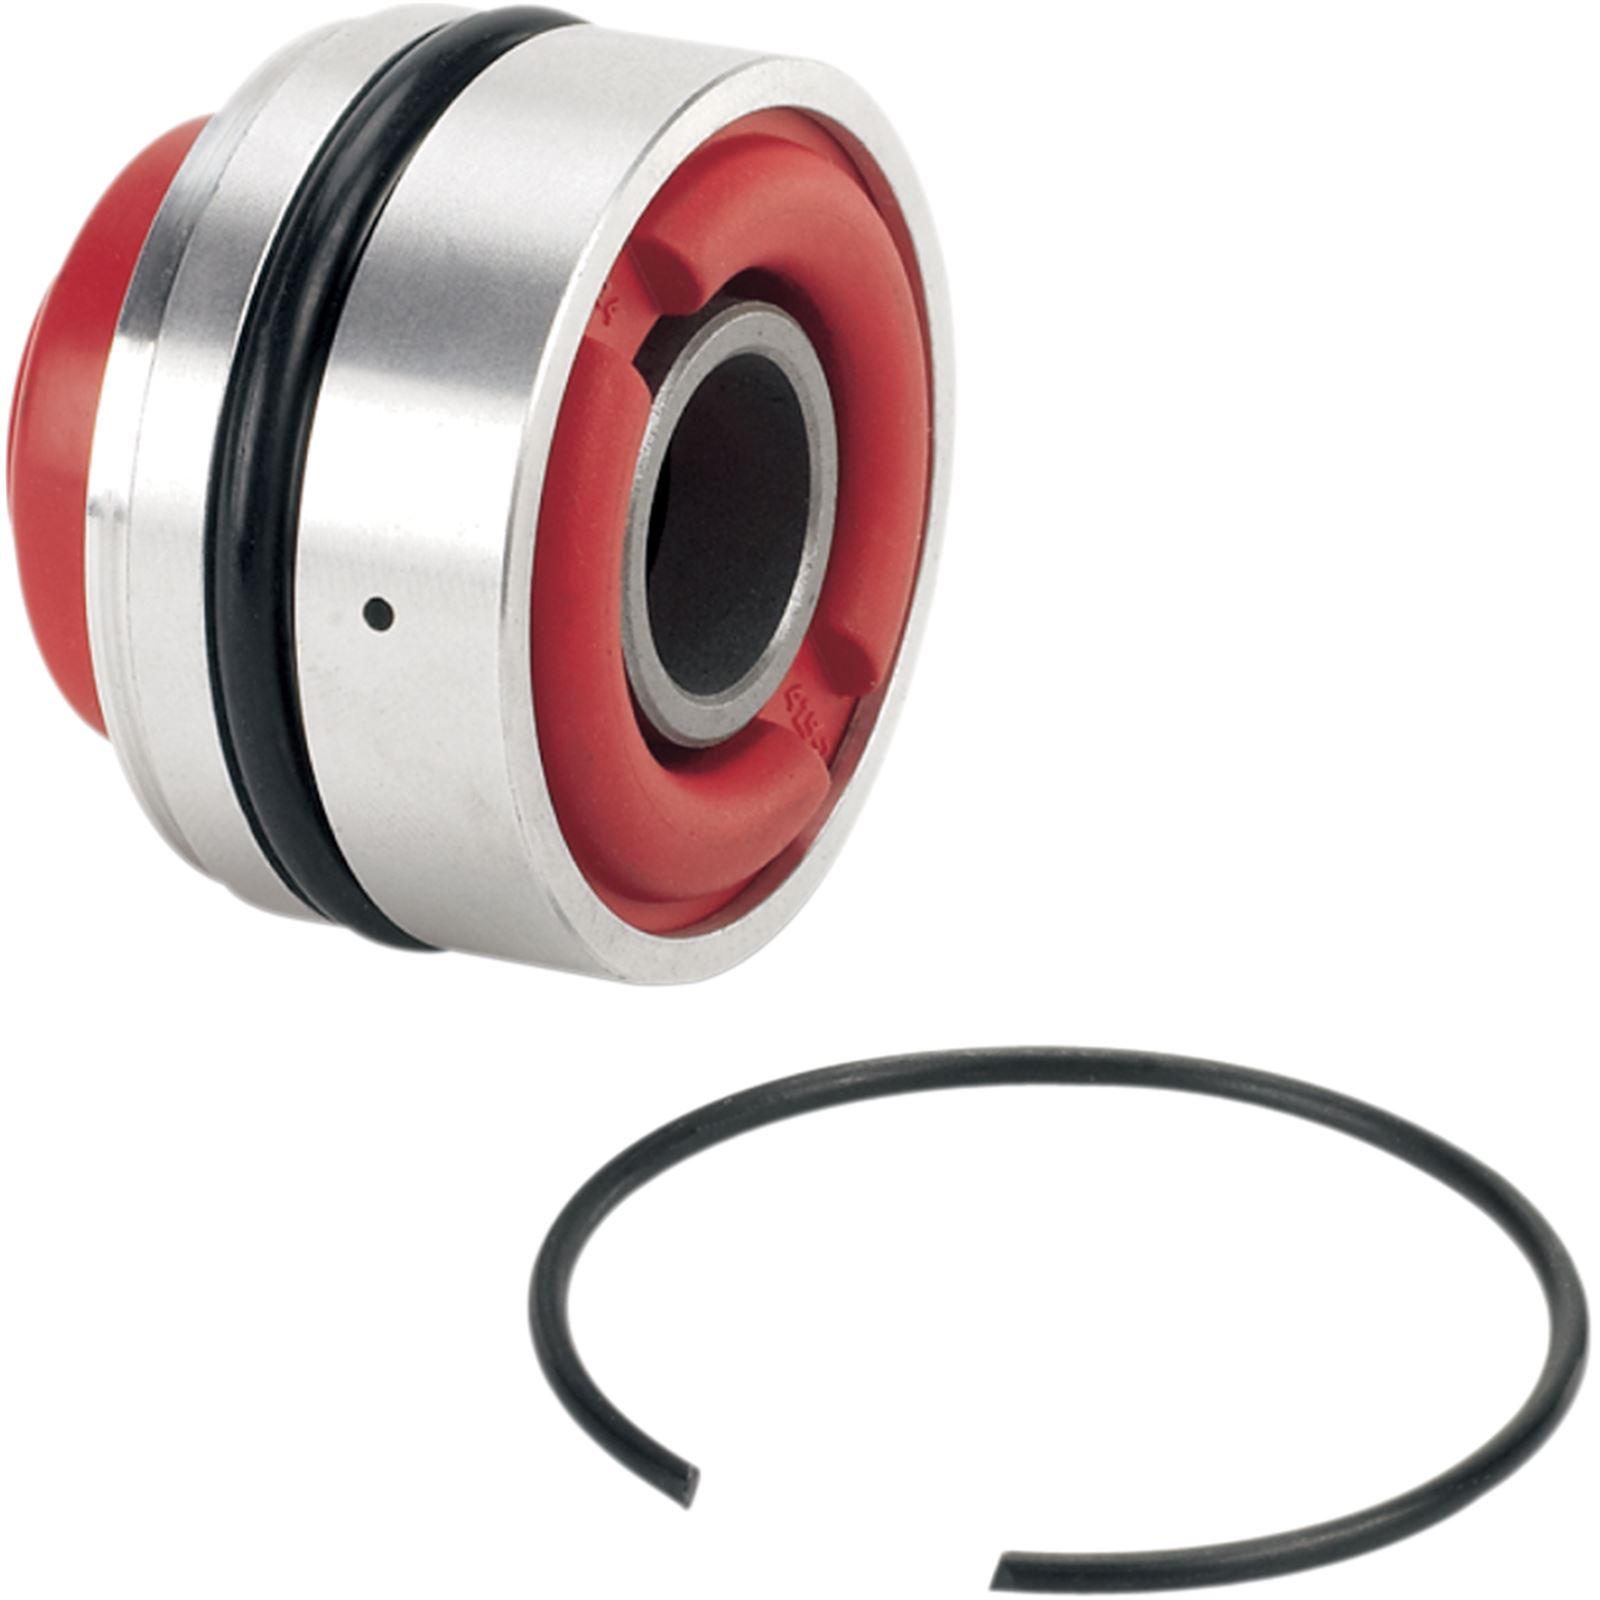 Moose Racing Shock Seal Head - 12.5 mm ID x 40 mm OD